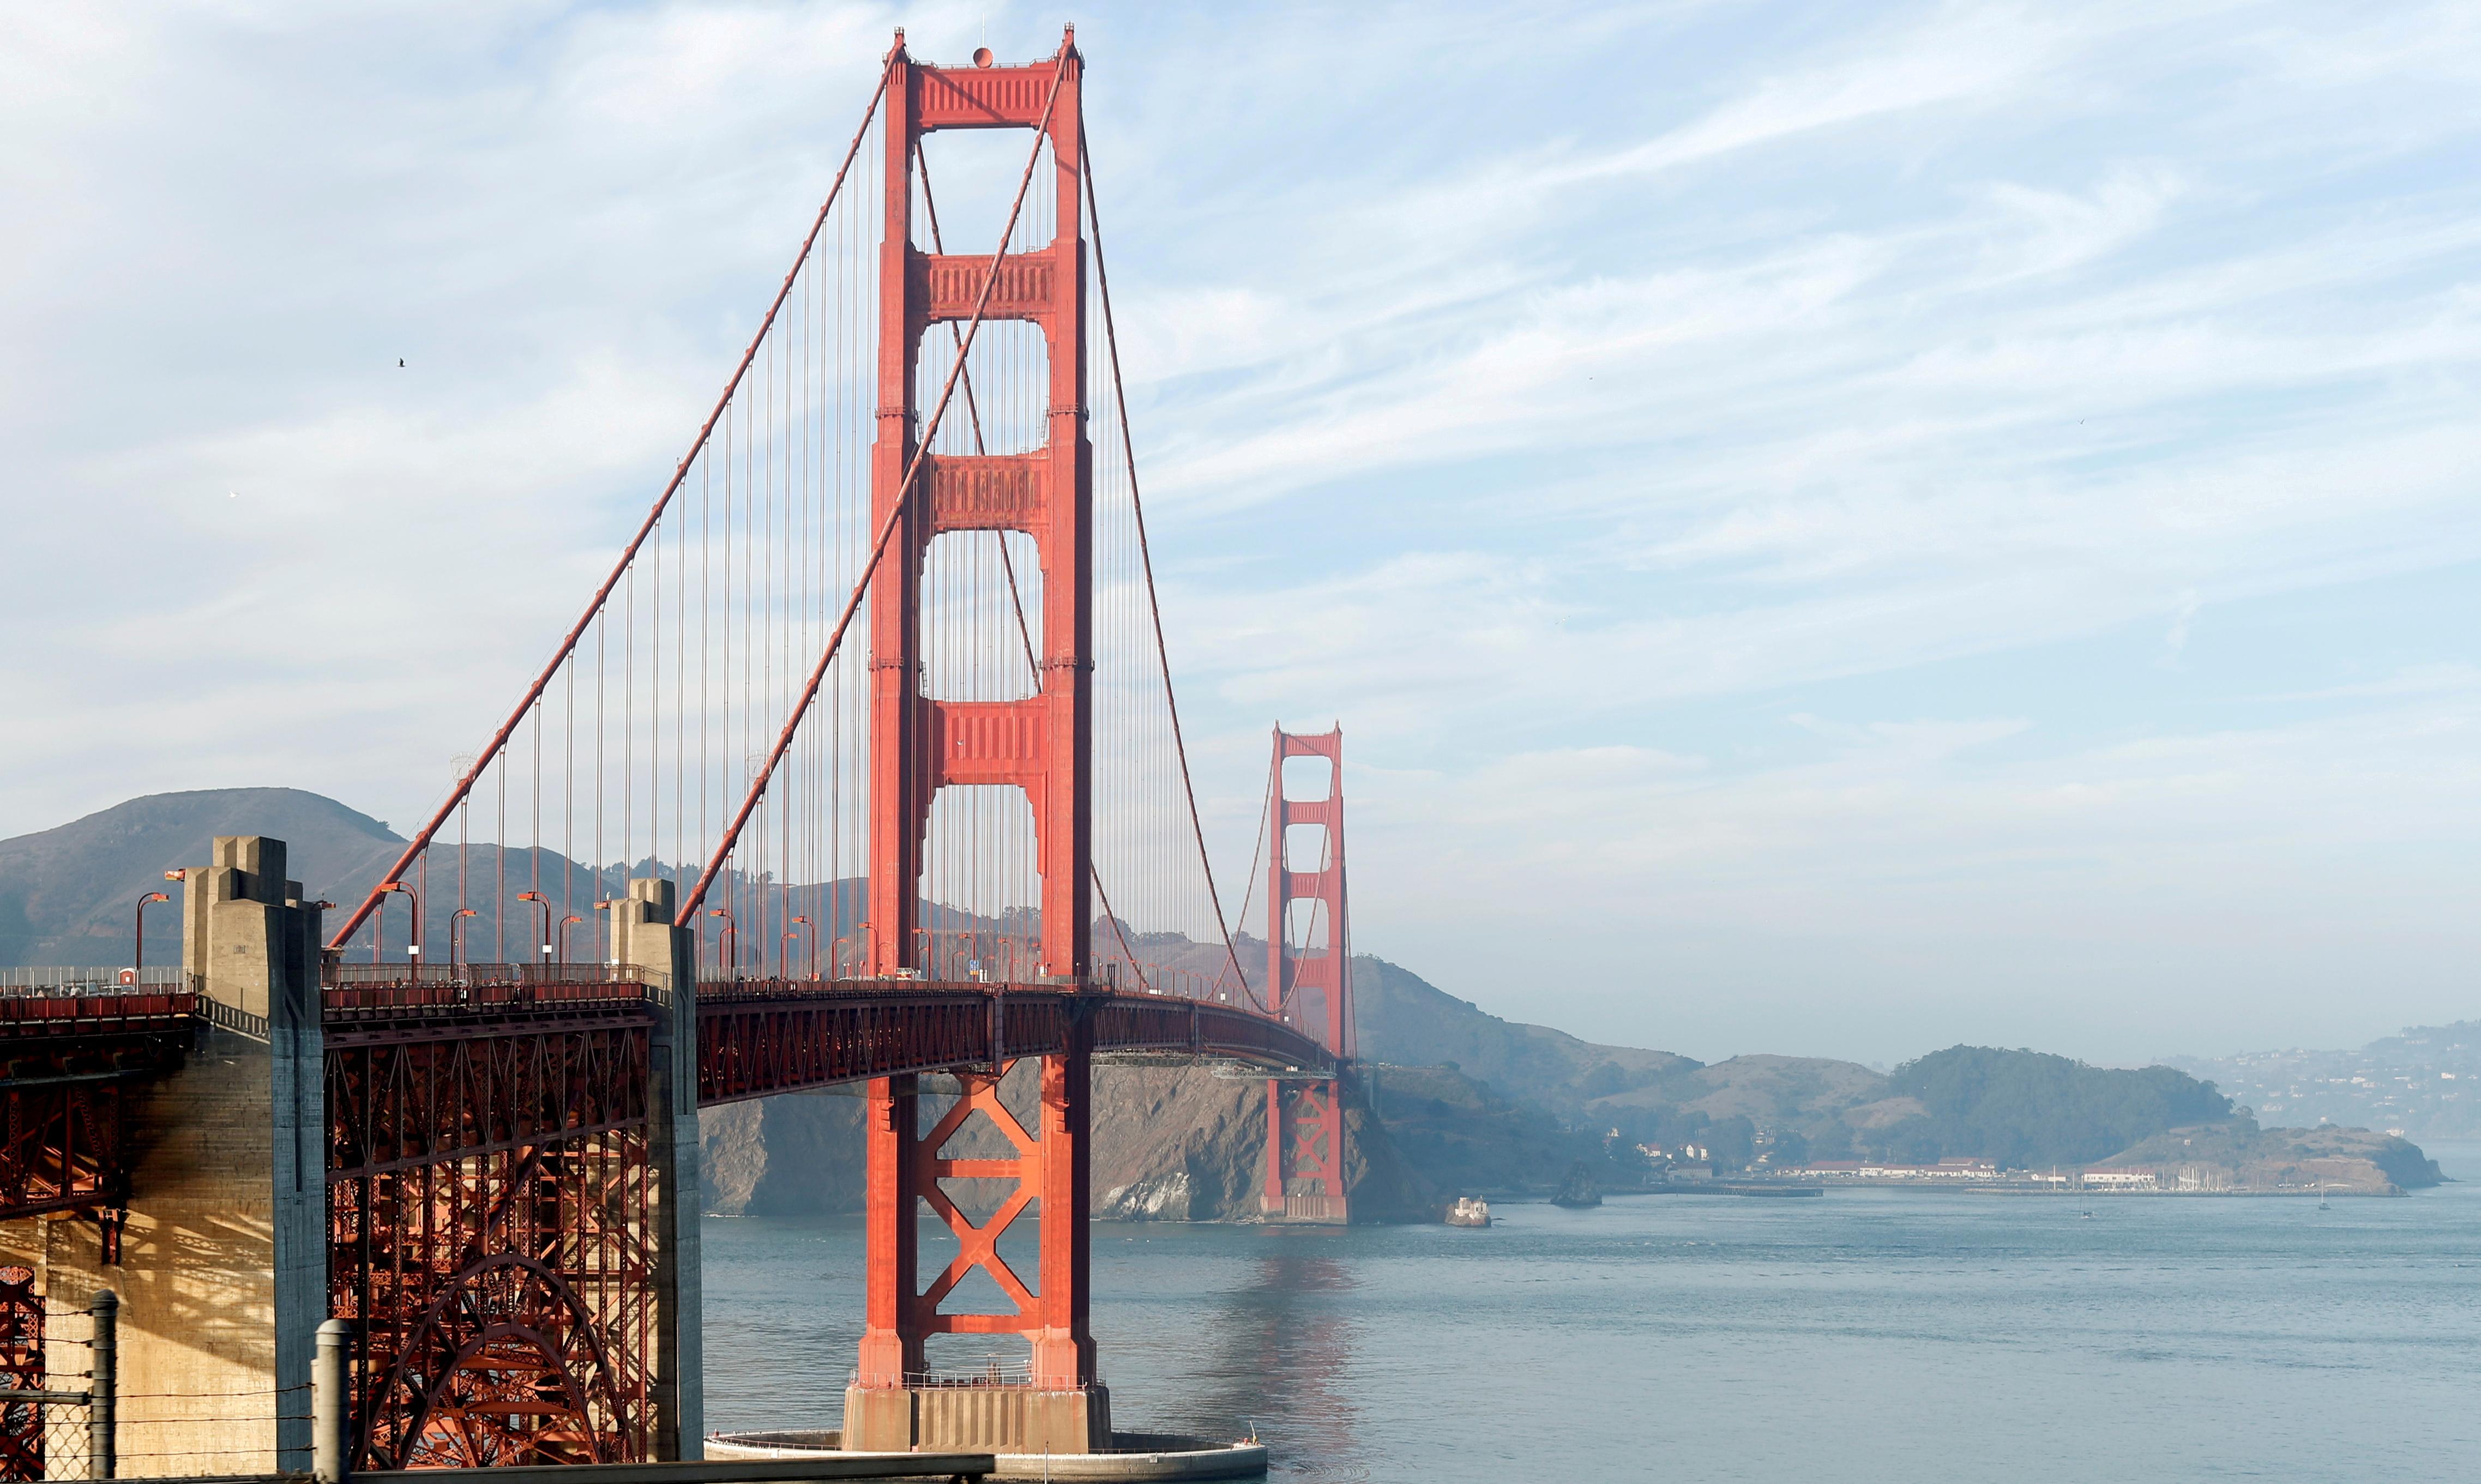 A view of the Golden Gate Bridge in San Francisco, California, U.S., November 20, 2018. REUTERS/Mario Anzuoni/File Photo